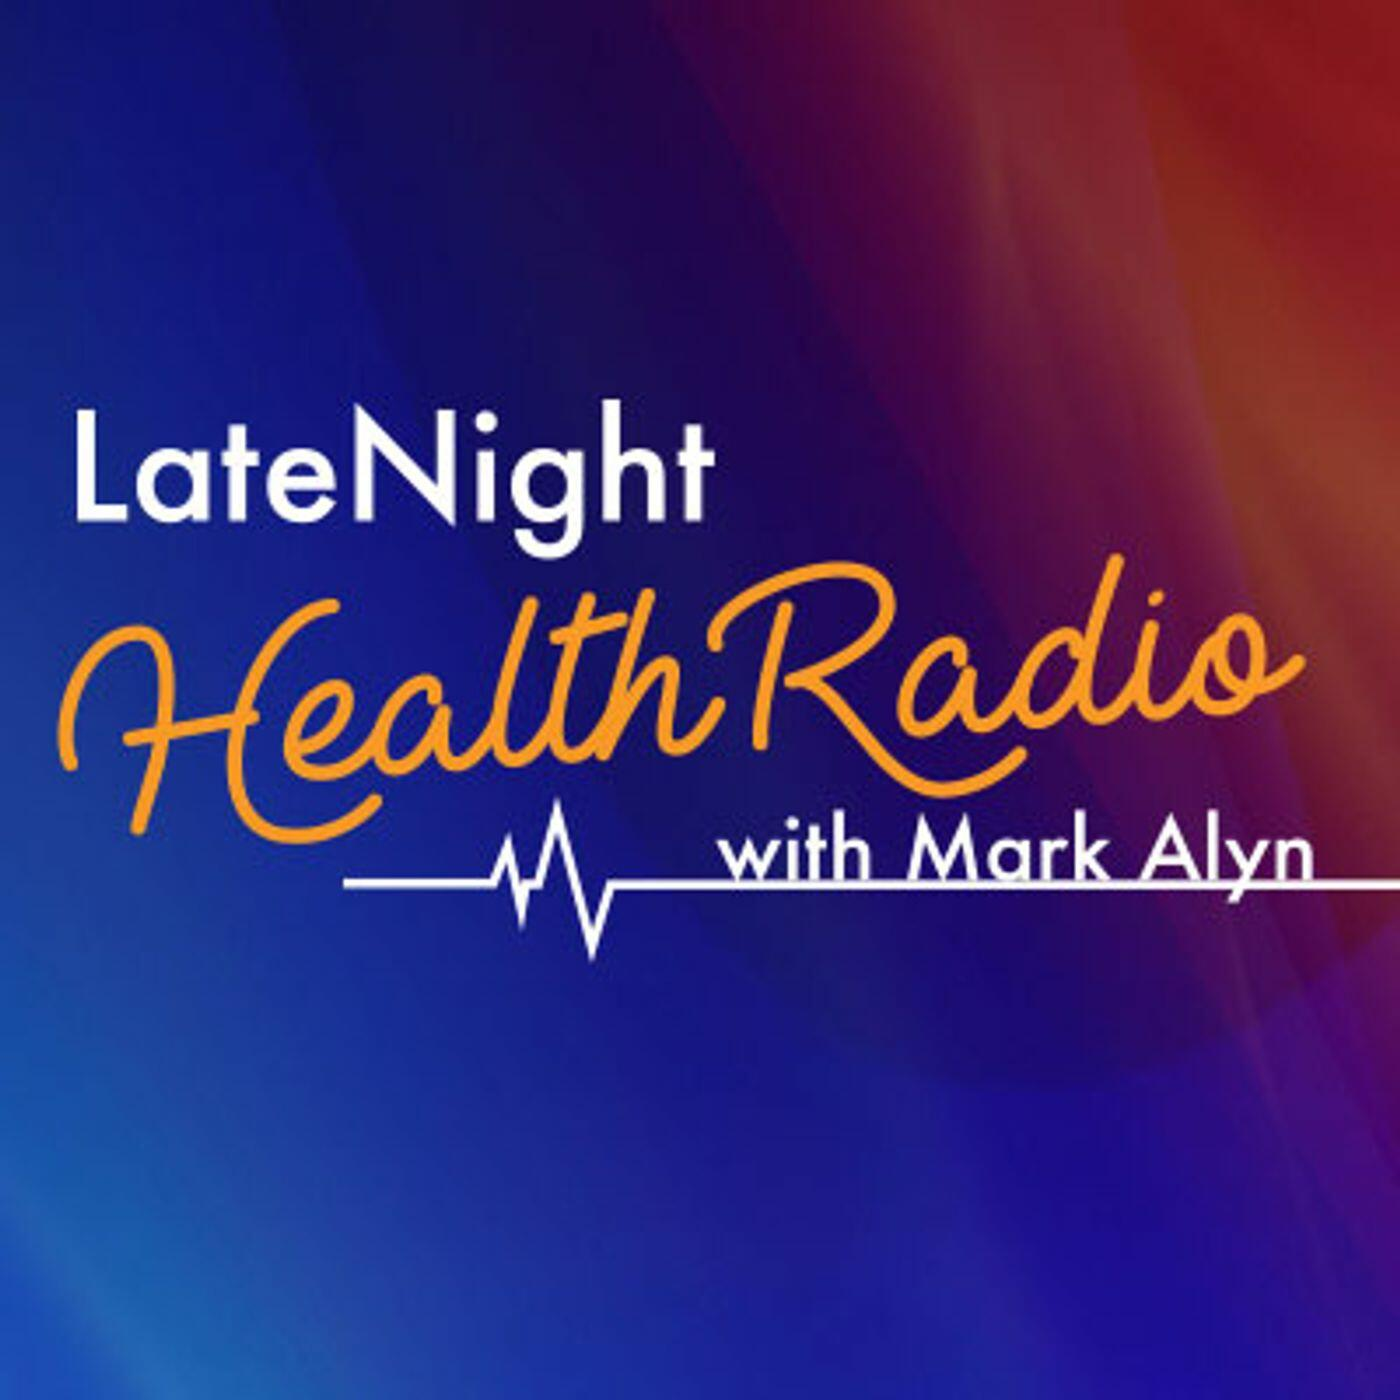 Late Night Health Radio